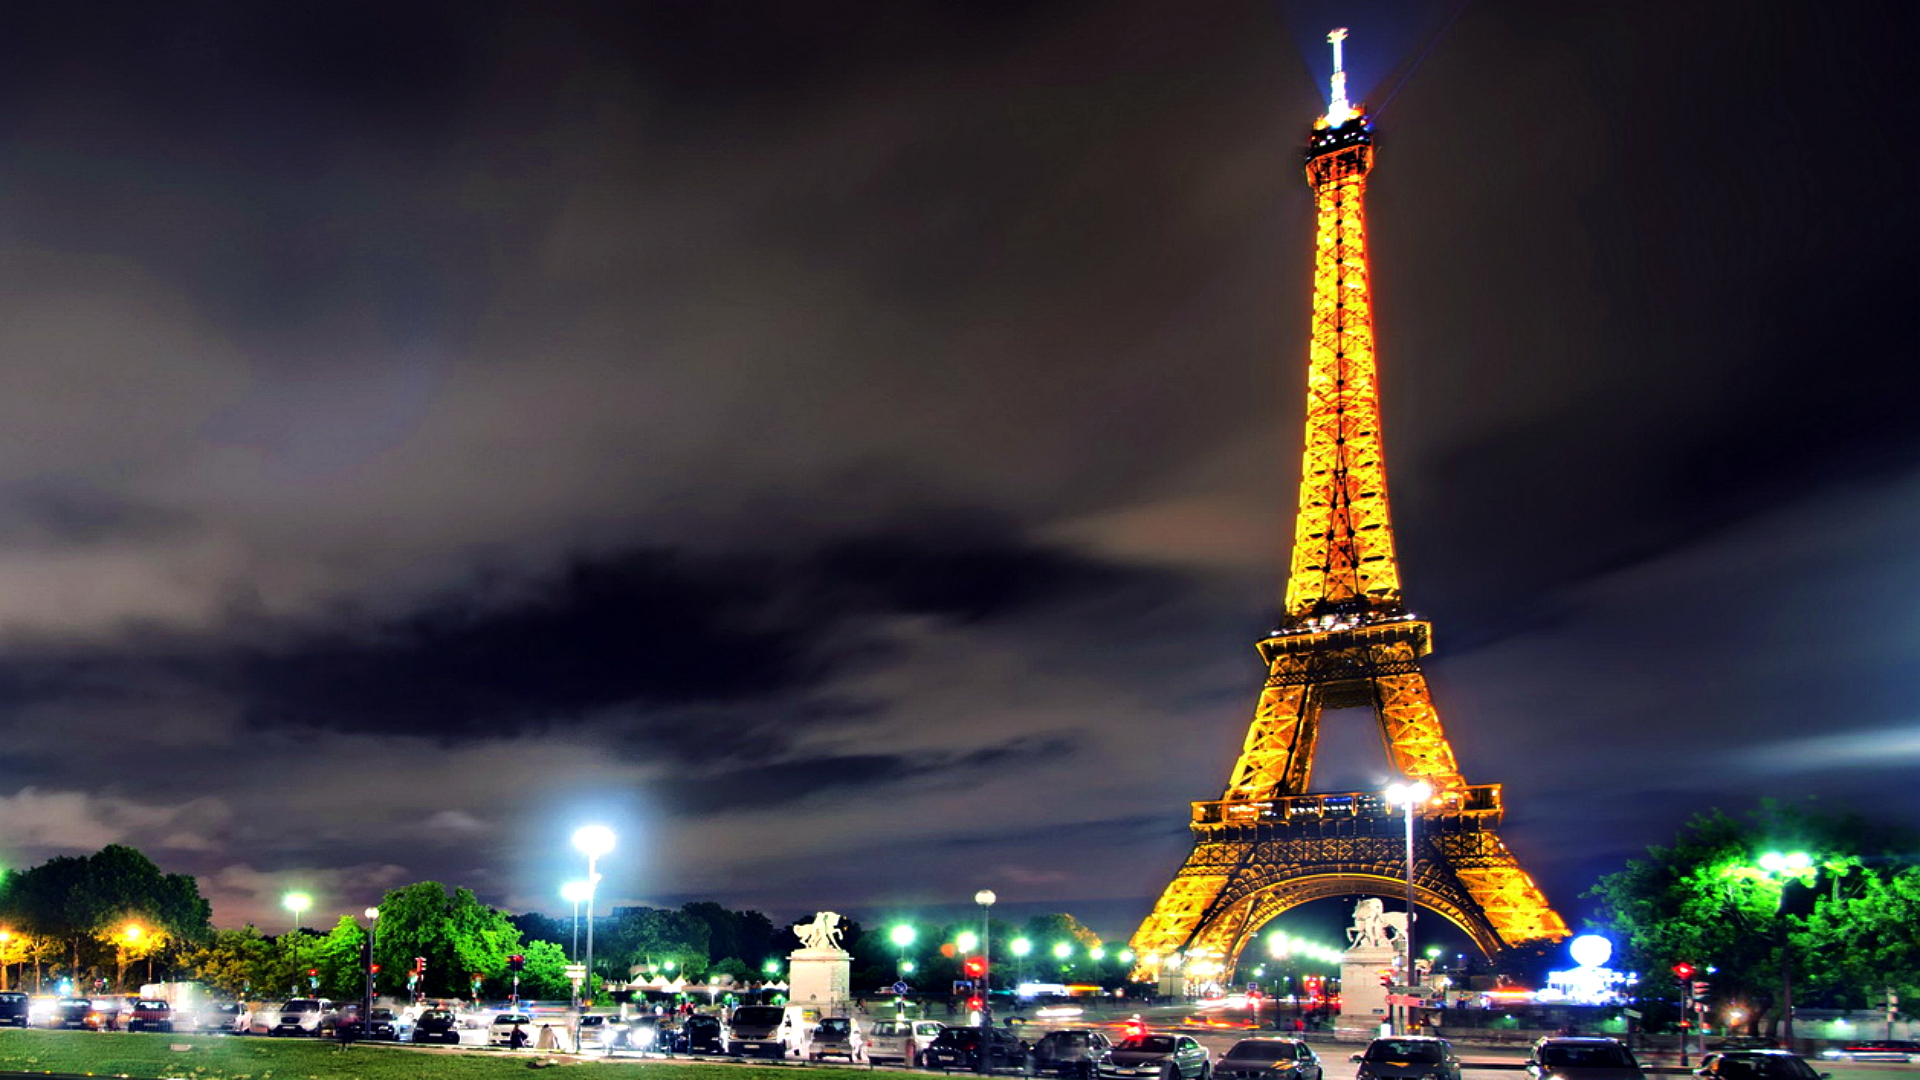 47 Eiffel Tower Cute Wallpaper On Wallpapersafari